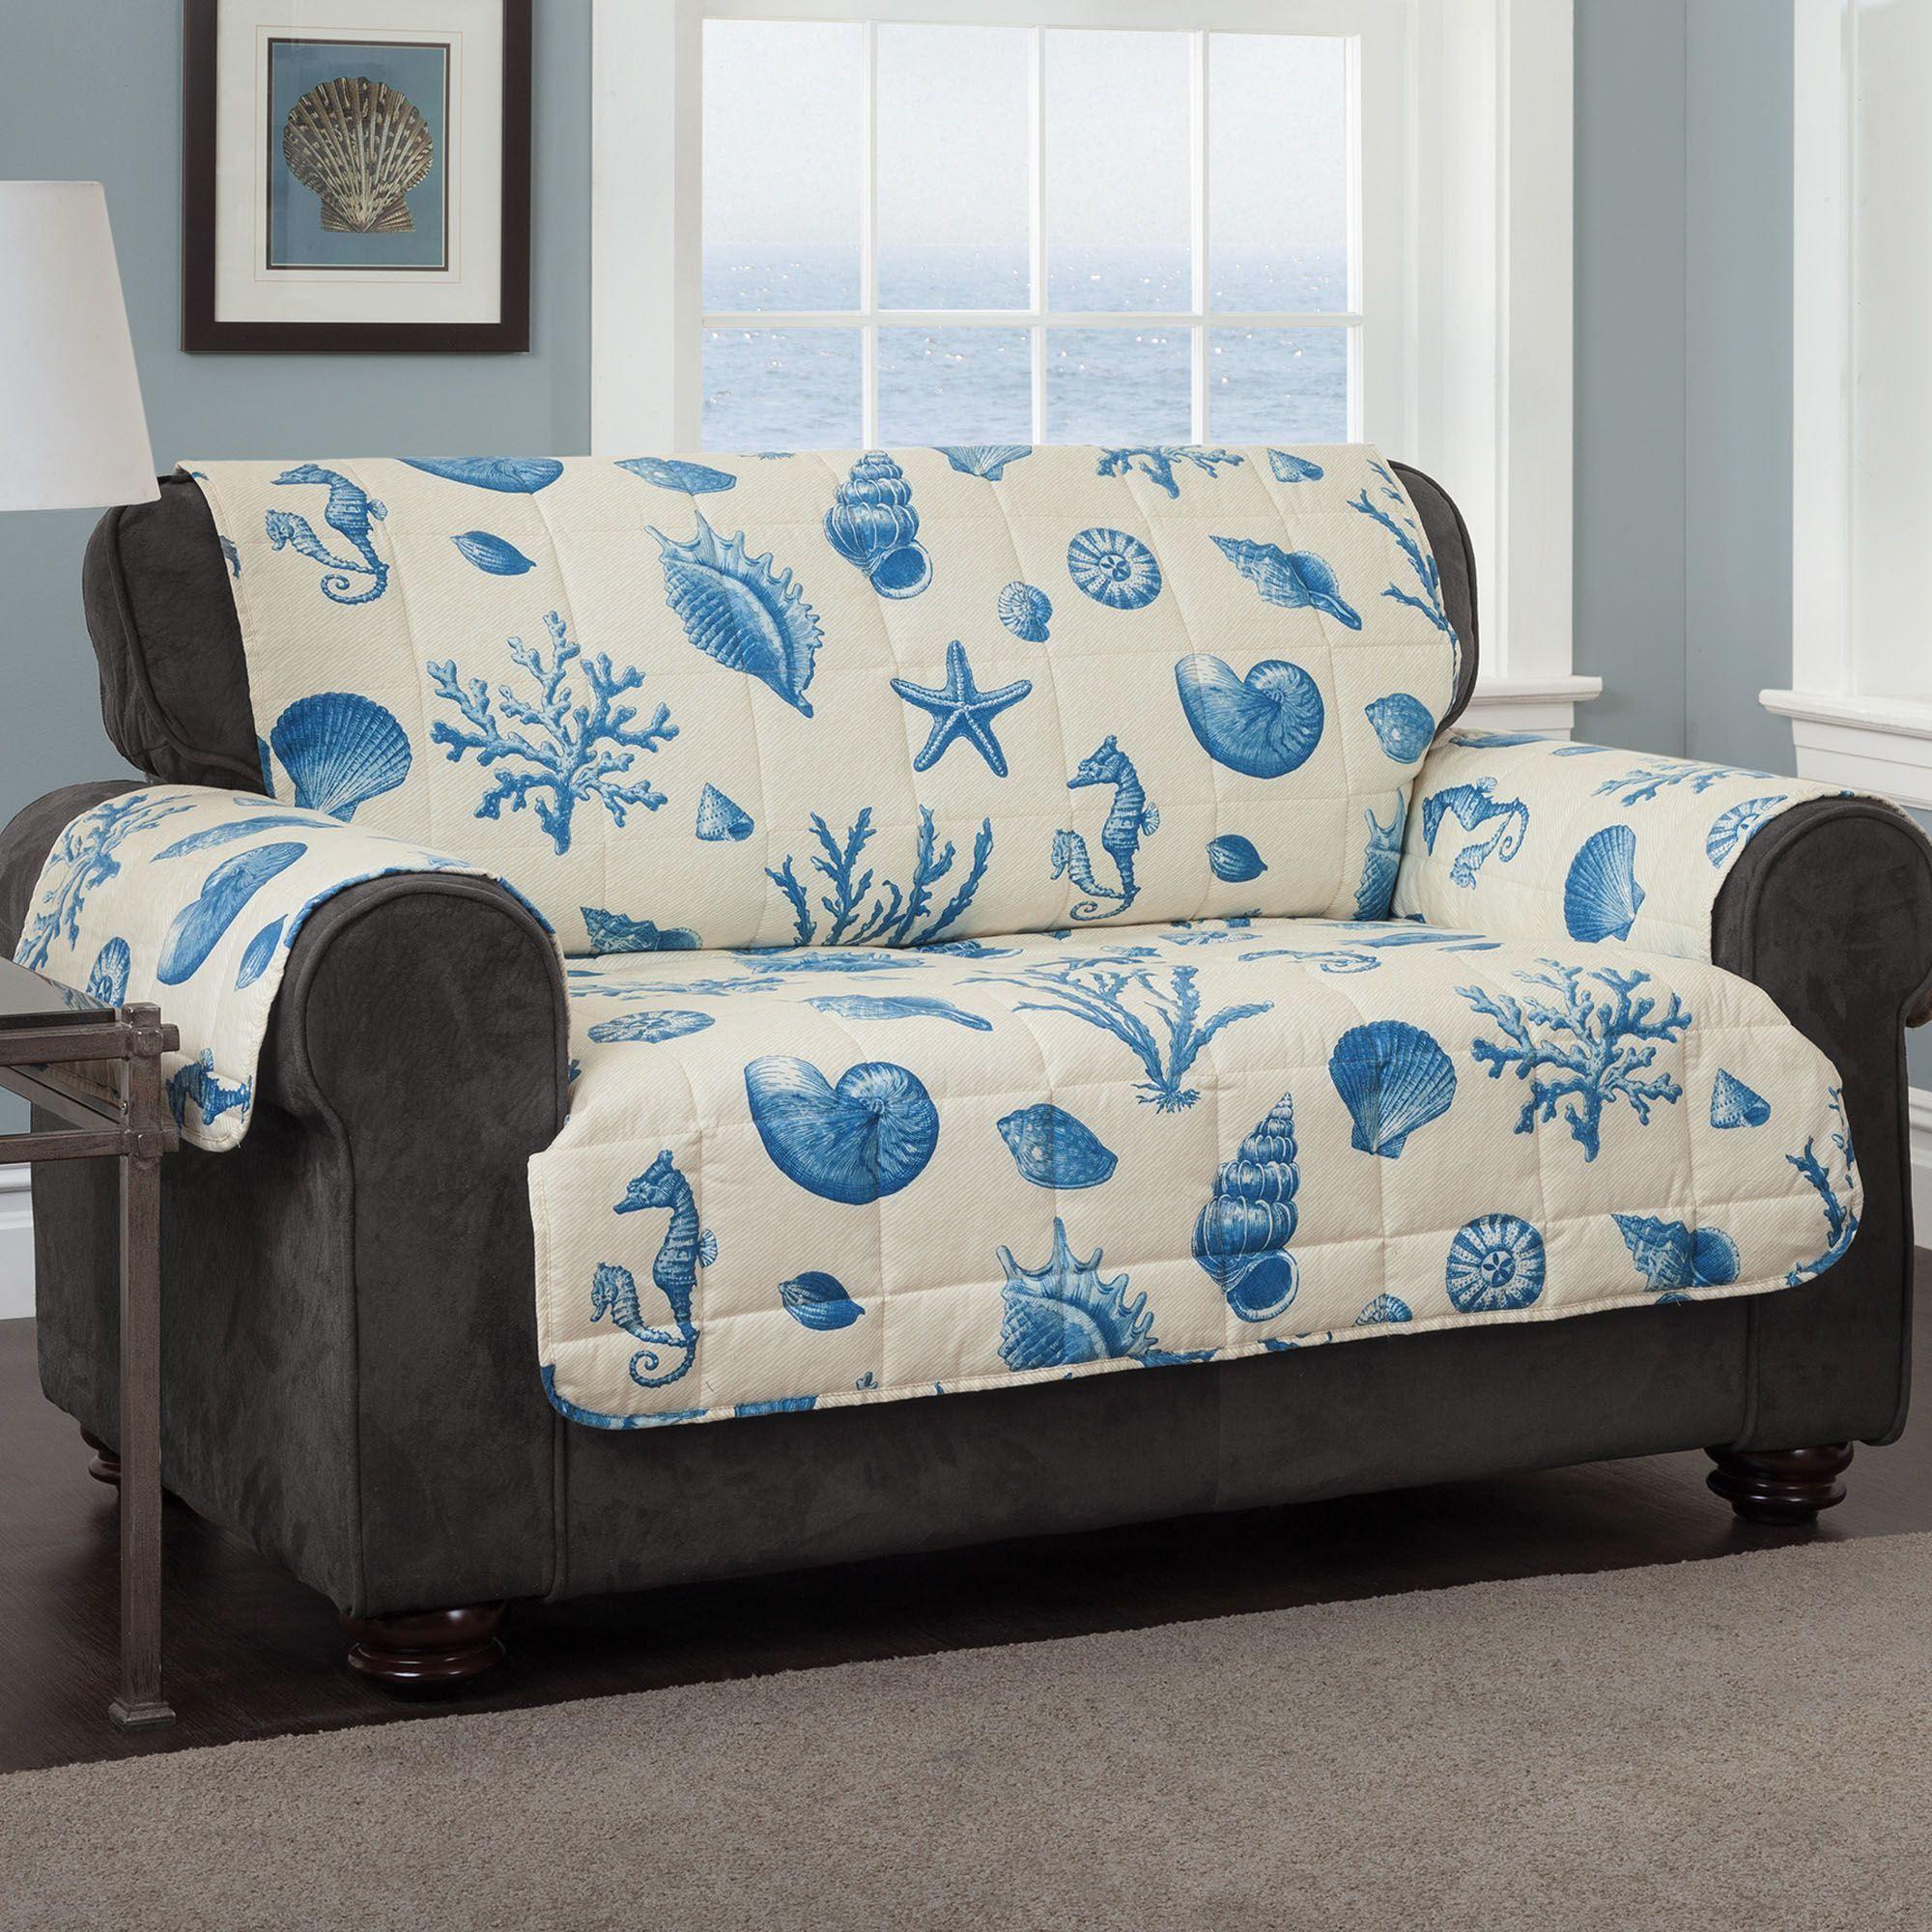 Exceptionnel Seashells Furniture Protector Cover Medium Blue Loveseat